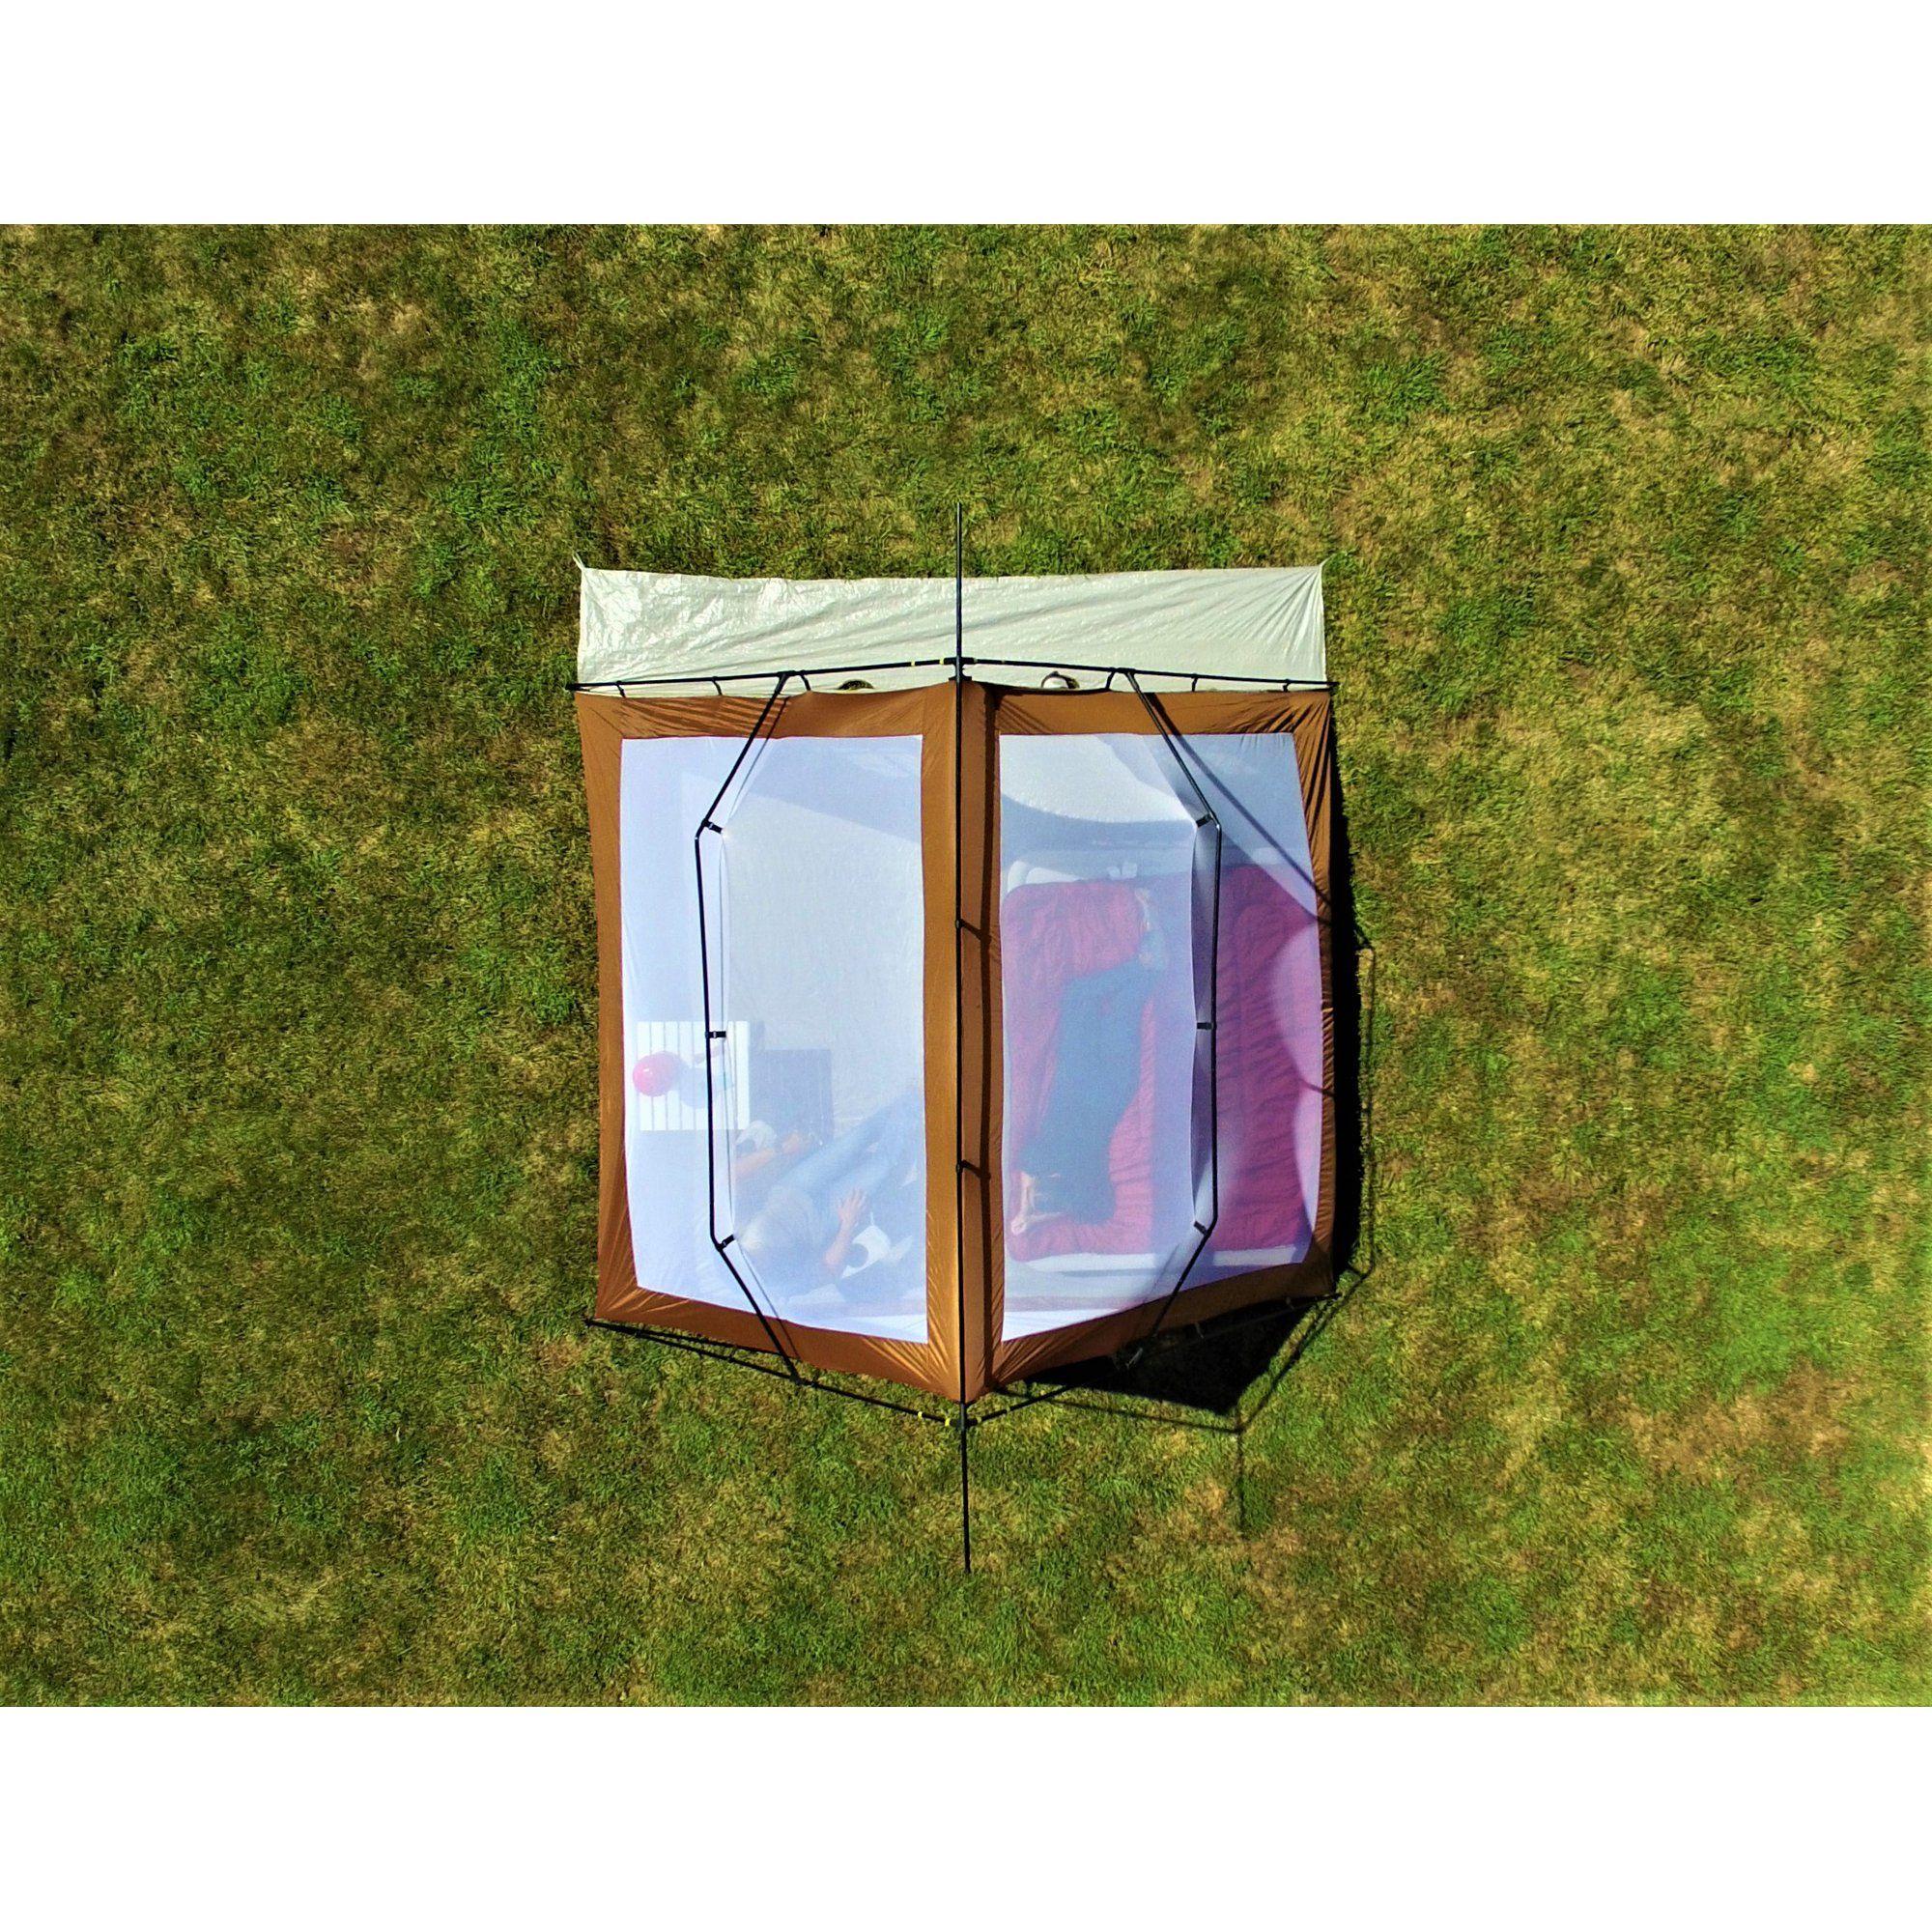 Ozark Trail 8 Person A Frame Outdoor Cabin Tent Walmart Com Cabin Tent Tent Cool Tents